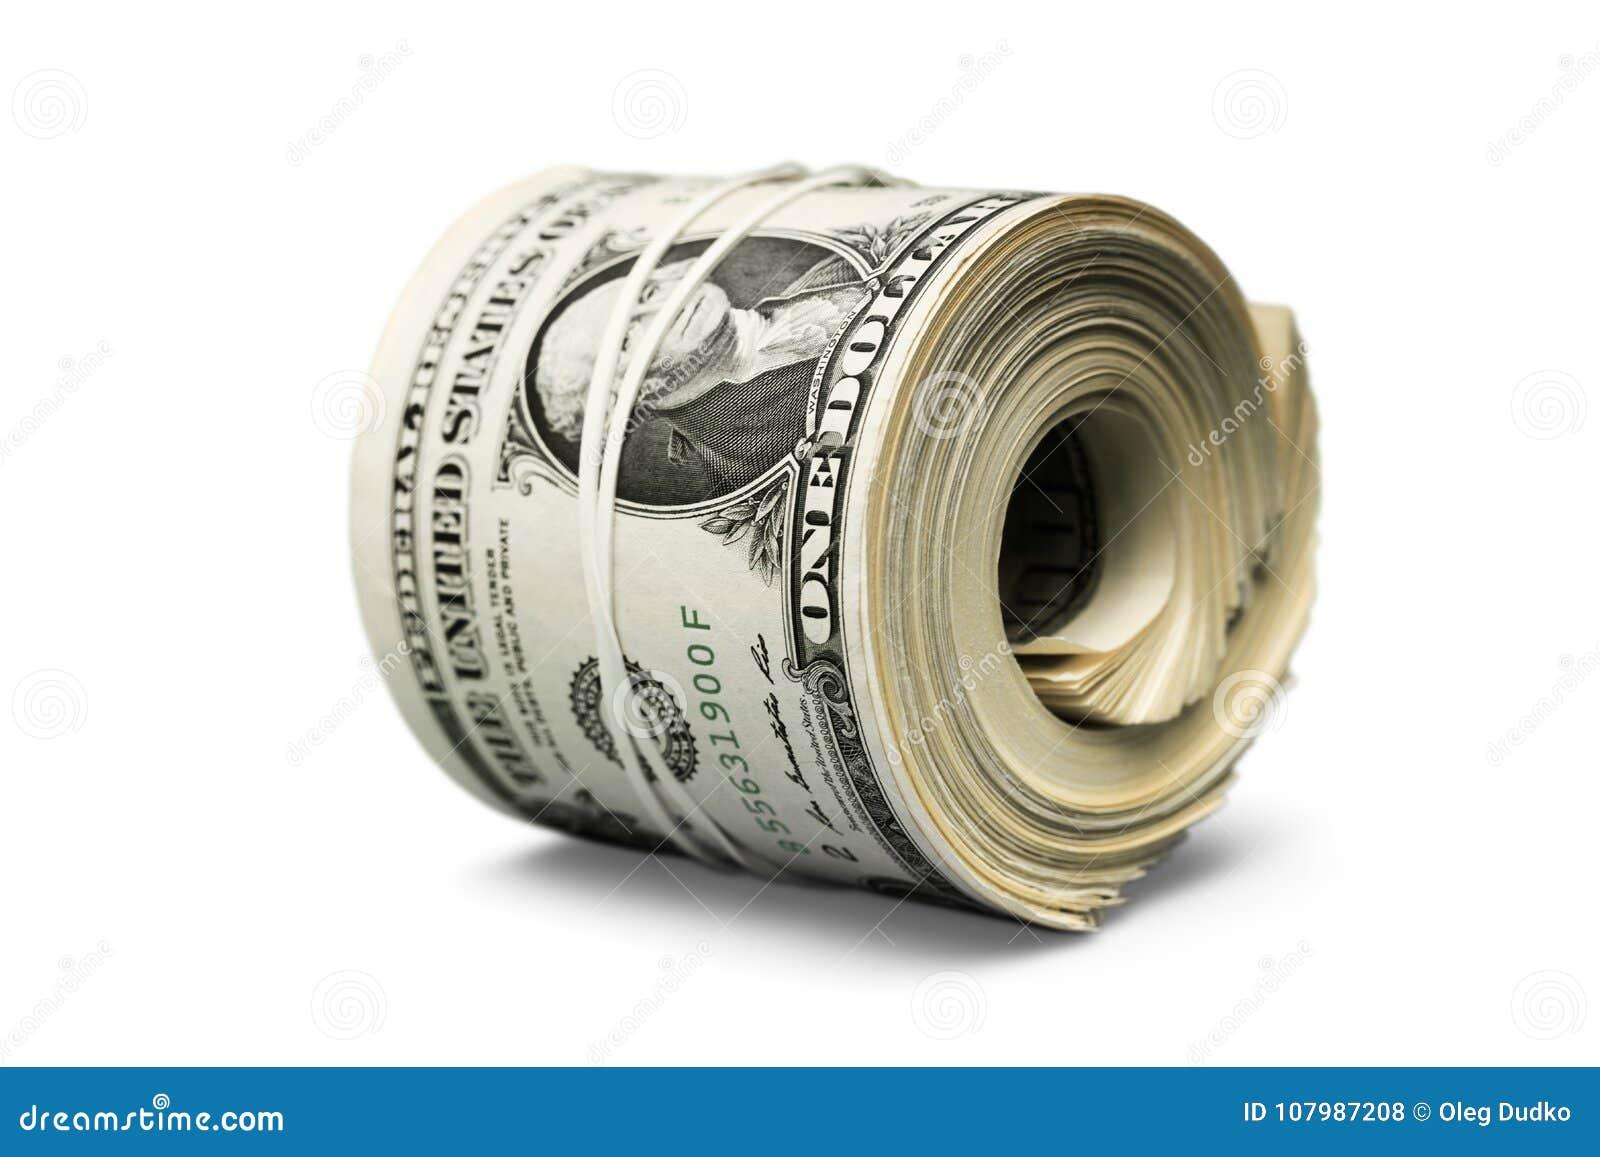 Dollarbroodje met band wordt aangehaald die Gerold geldknipsel